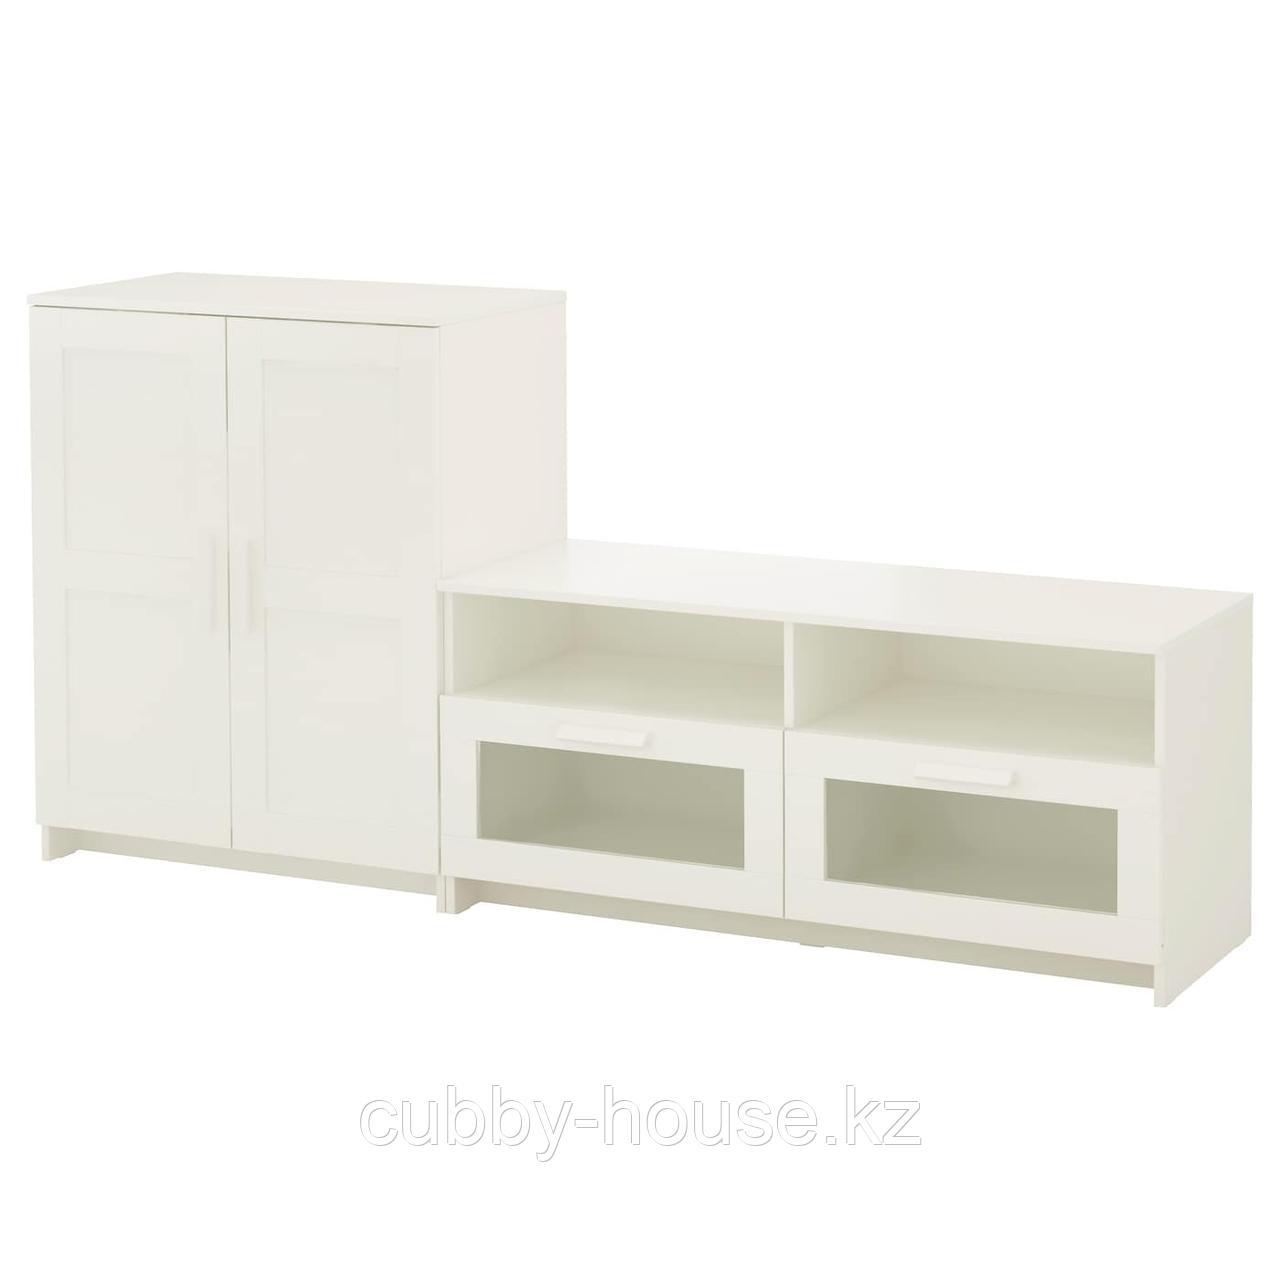 БРИМНЭС Шкаф для ТВ, комбинация, (белый, чёрный) 200x41x95 см